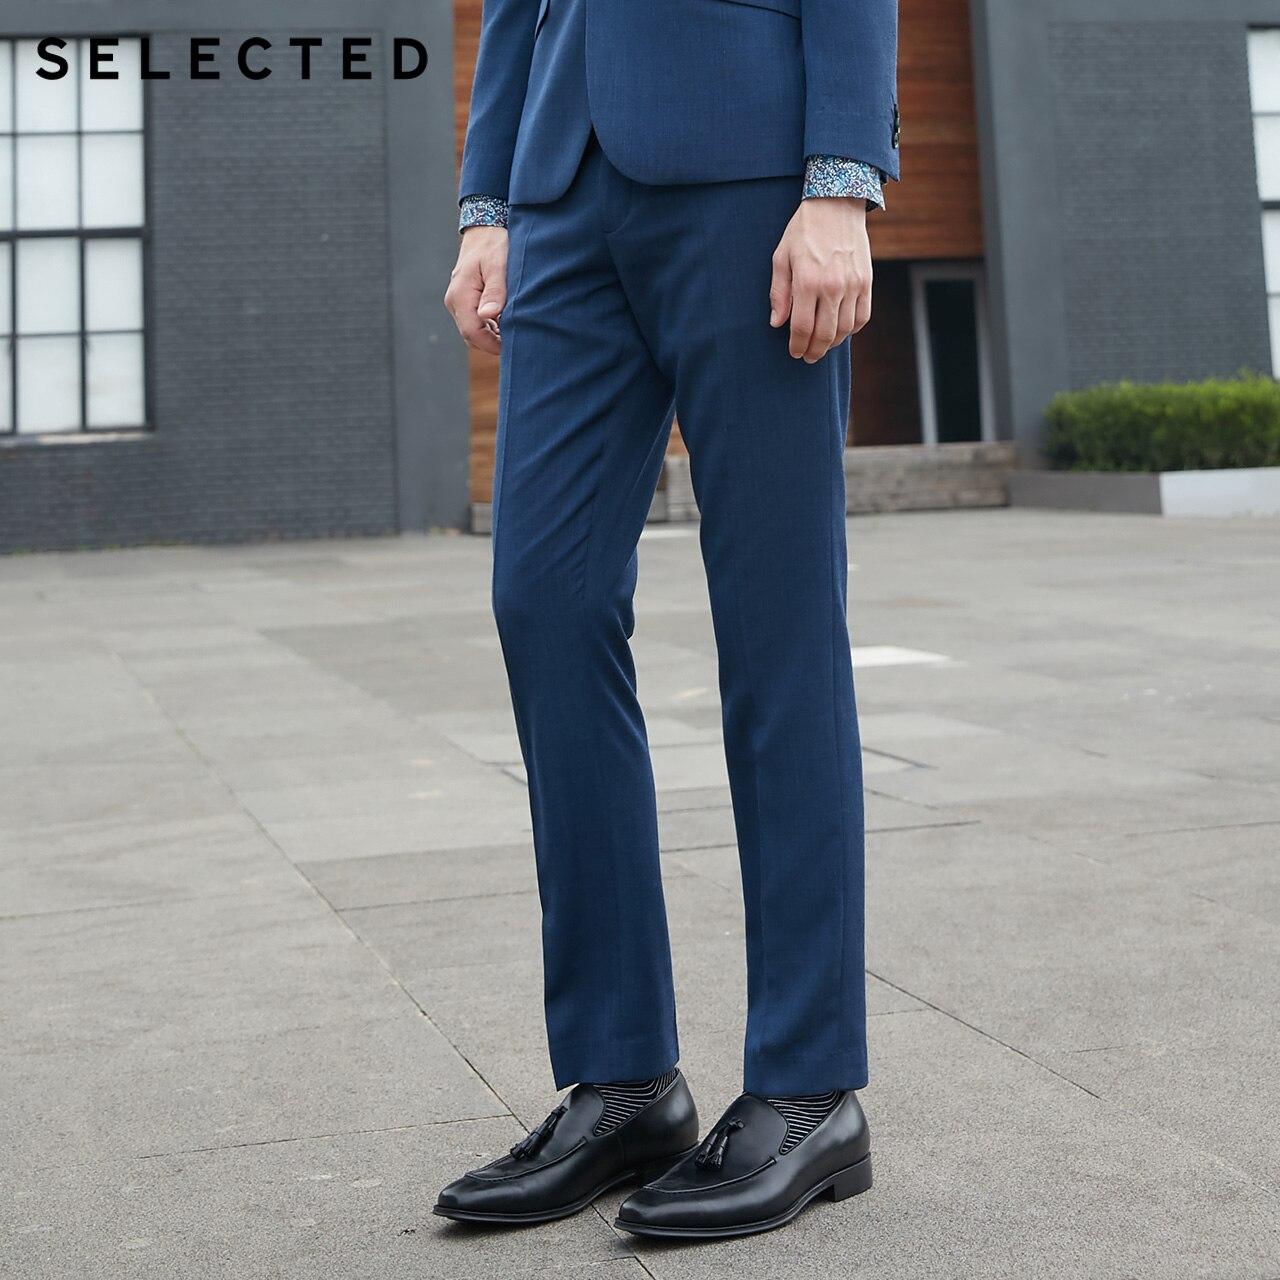 SELECTED new man pure color simple business pants suit trousersT41836A503-in Broek pak van Mannenkleding op AliExpress - 11.11_Dubbel 11Vrijgezellendag 1